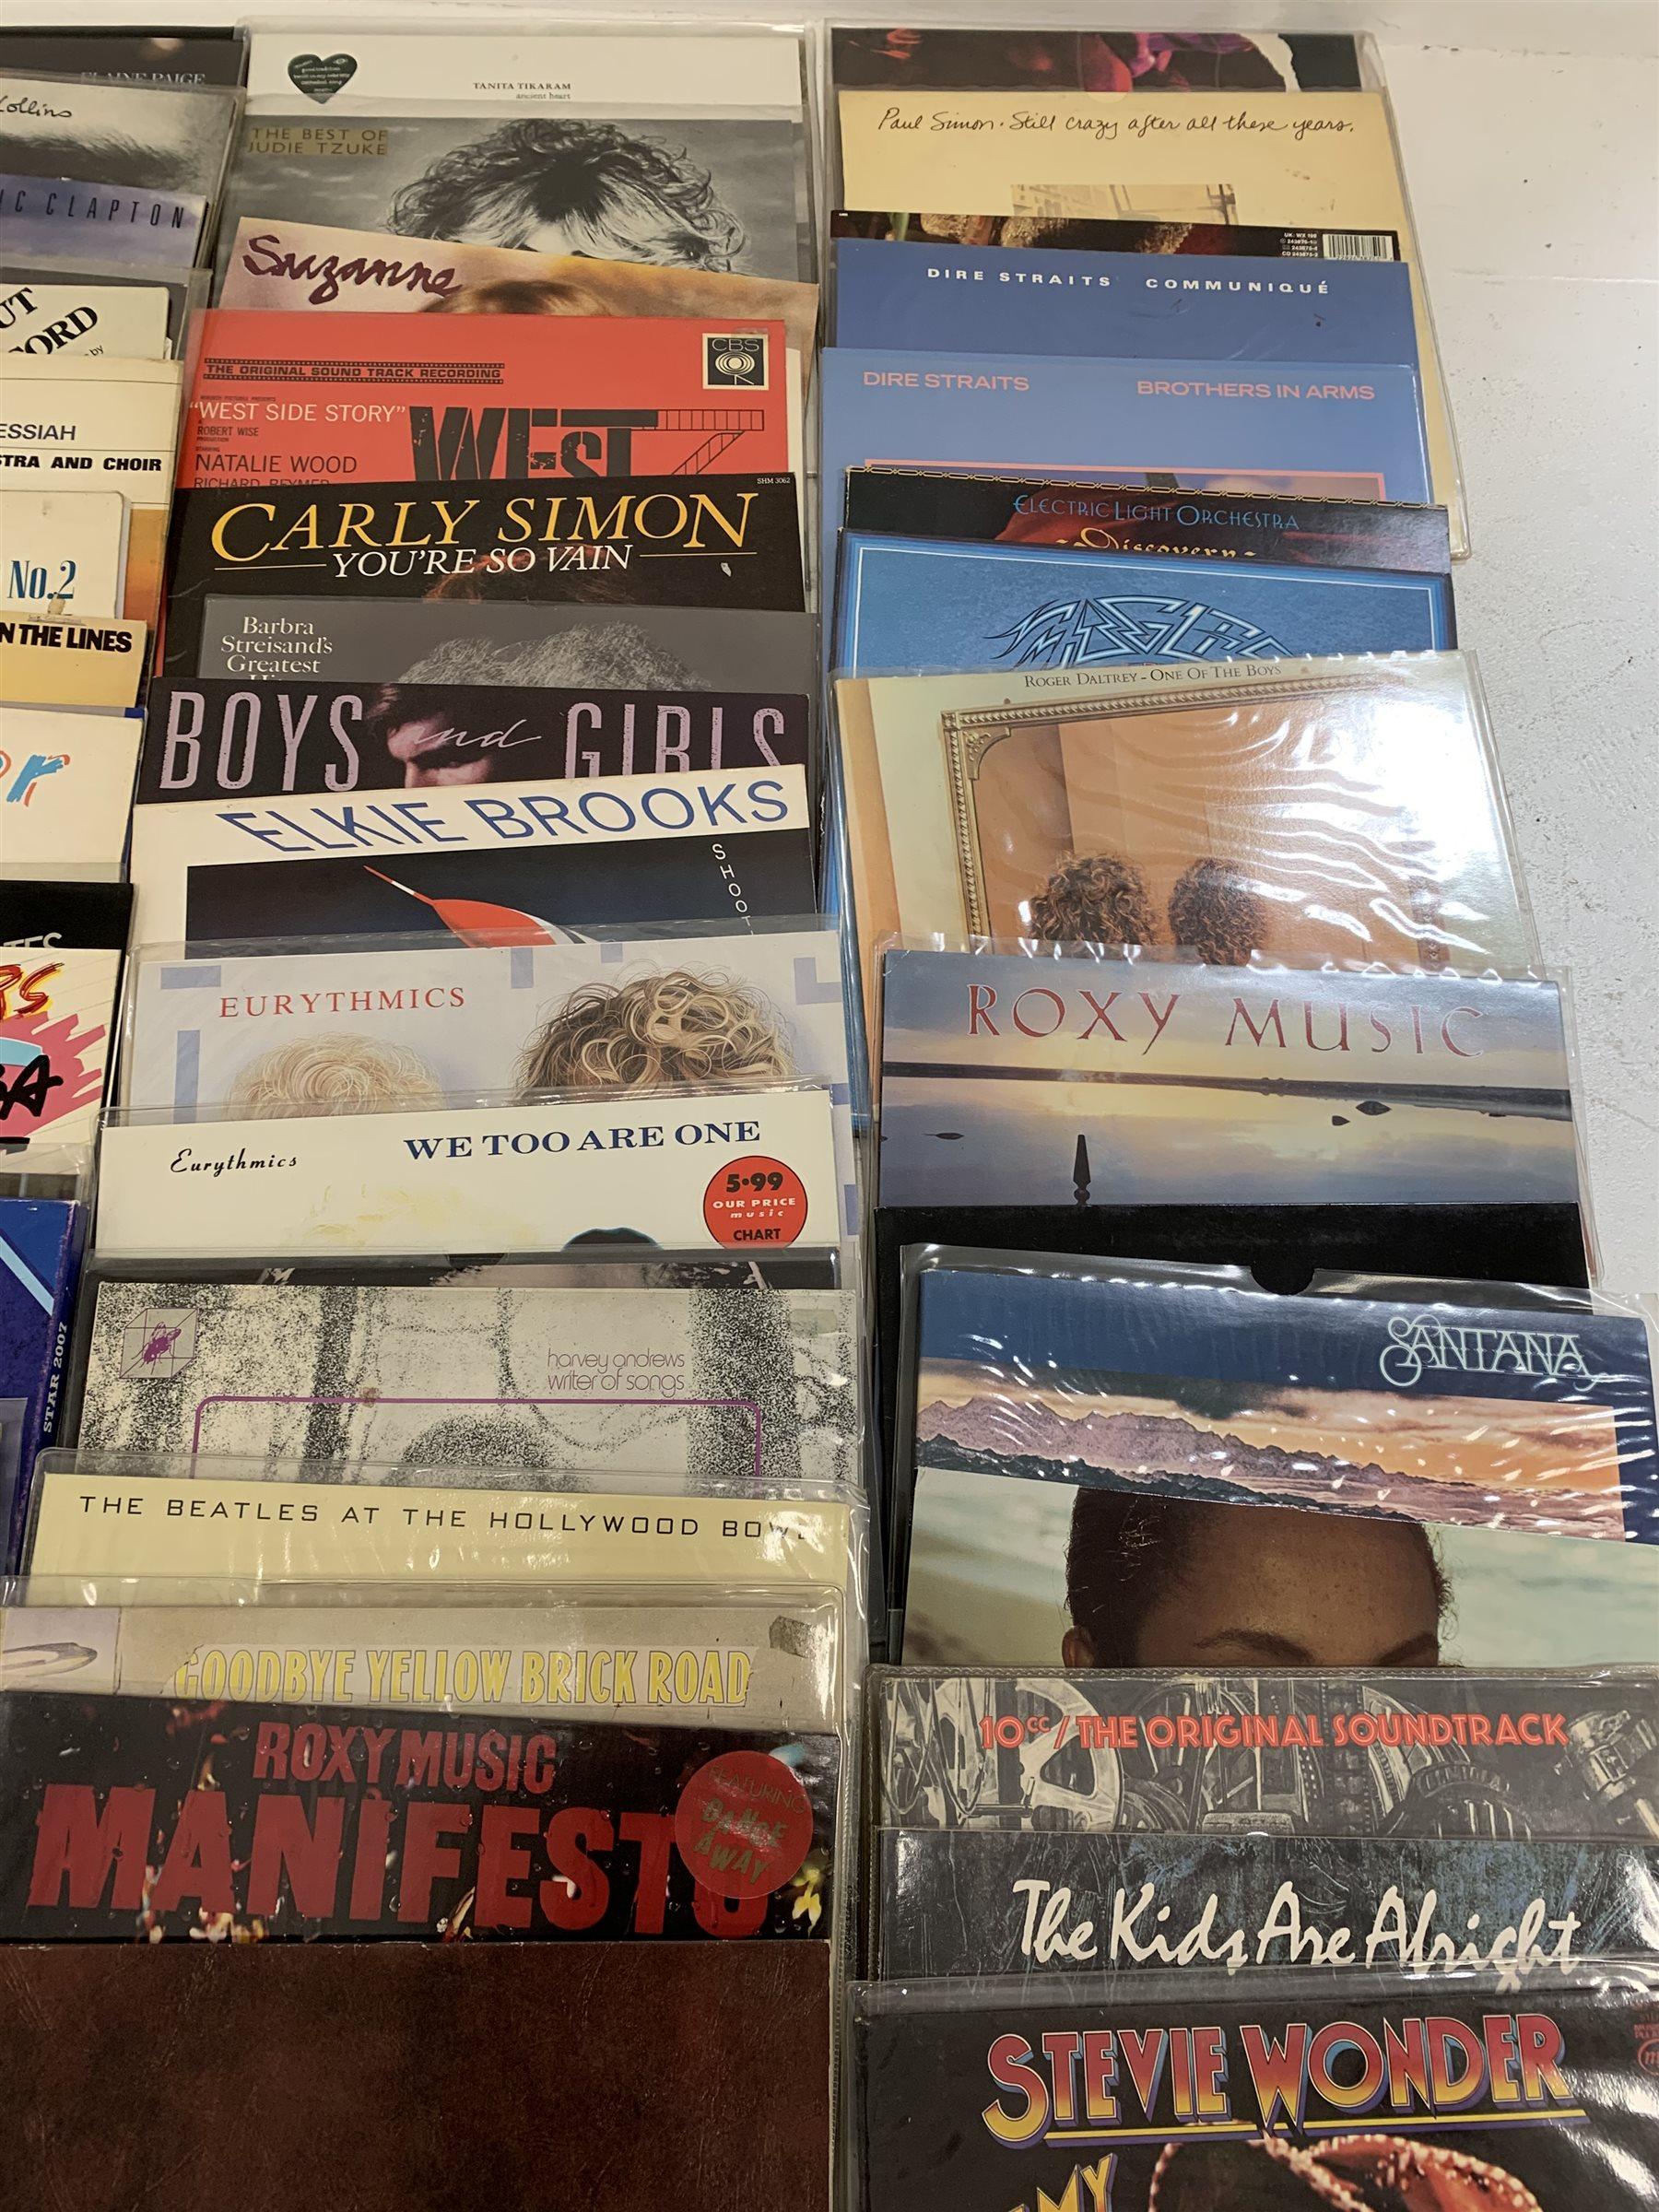 A quantity of LP's to include Elton John, Lionel Richie, Jimi Hendrix, The Beatles, Paul Simon, The - Image 4 of 7